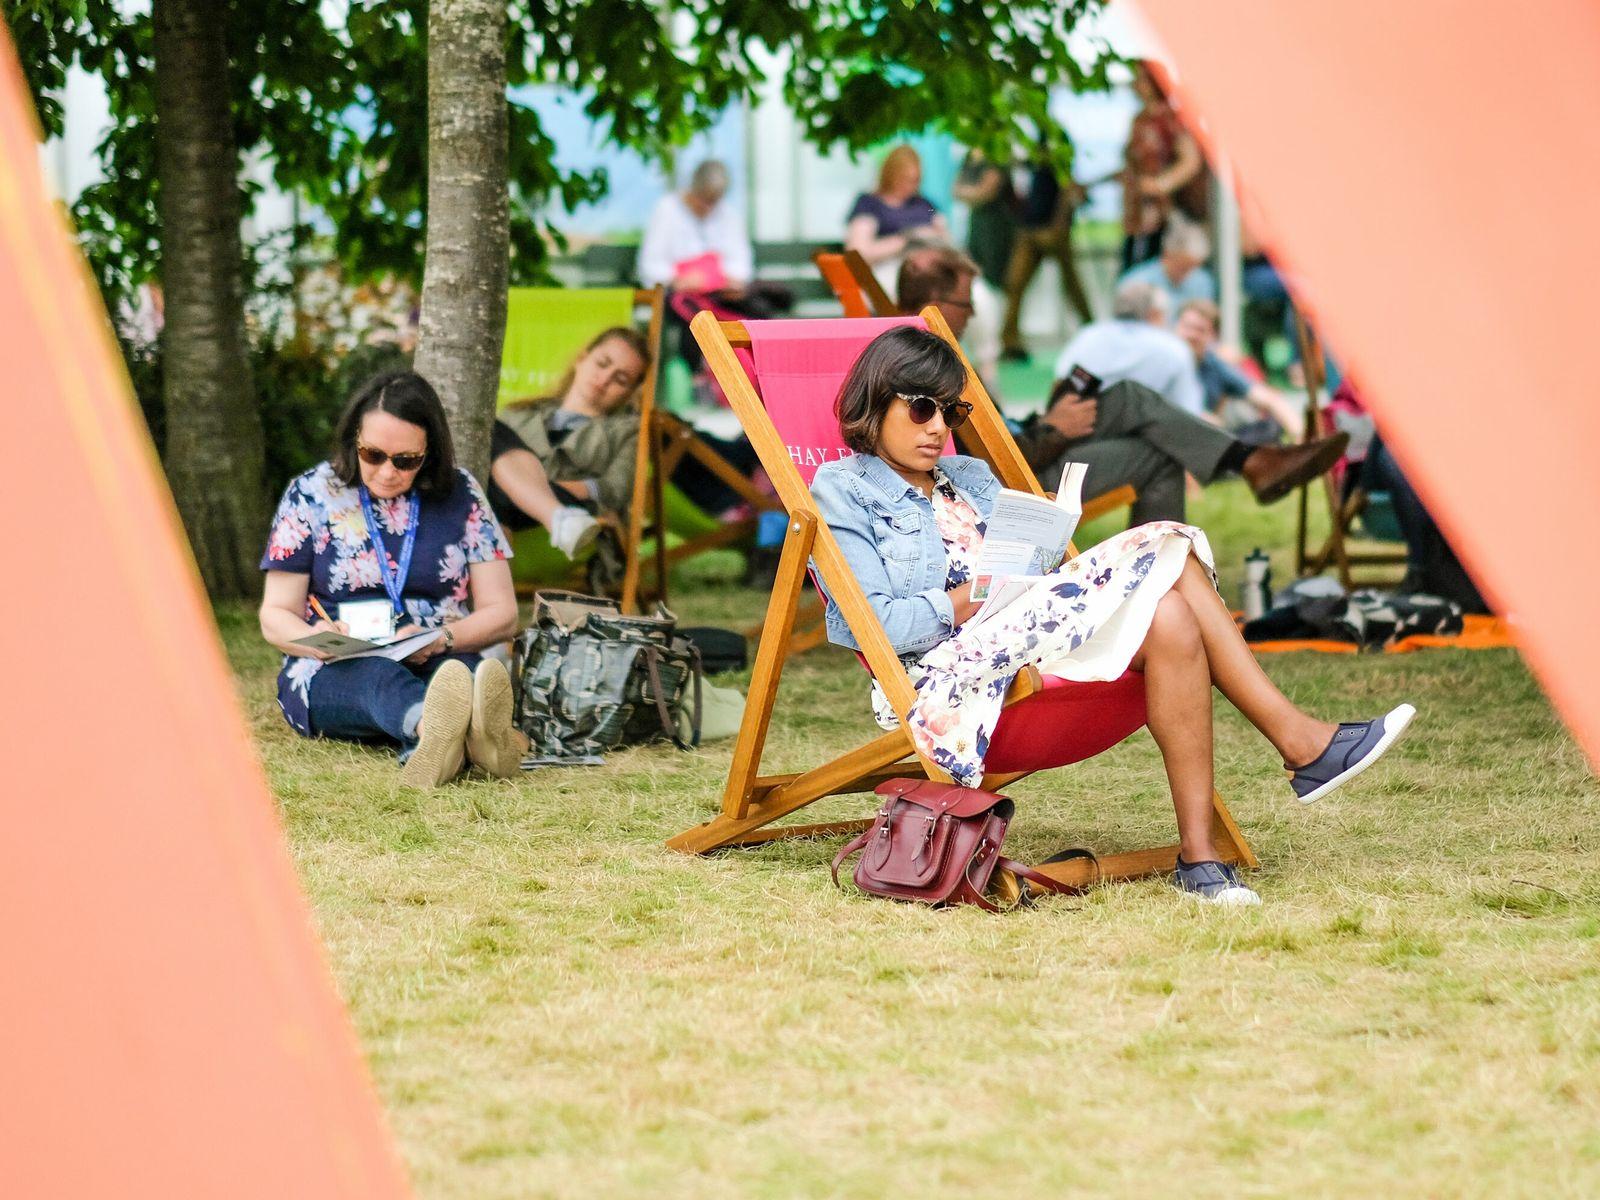 A festival attendeein a deckchair enjoys a book at 2019'sHay Festival, Wales.